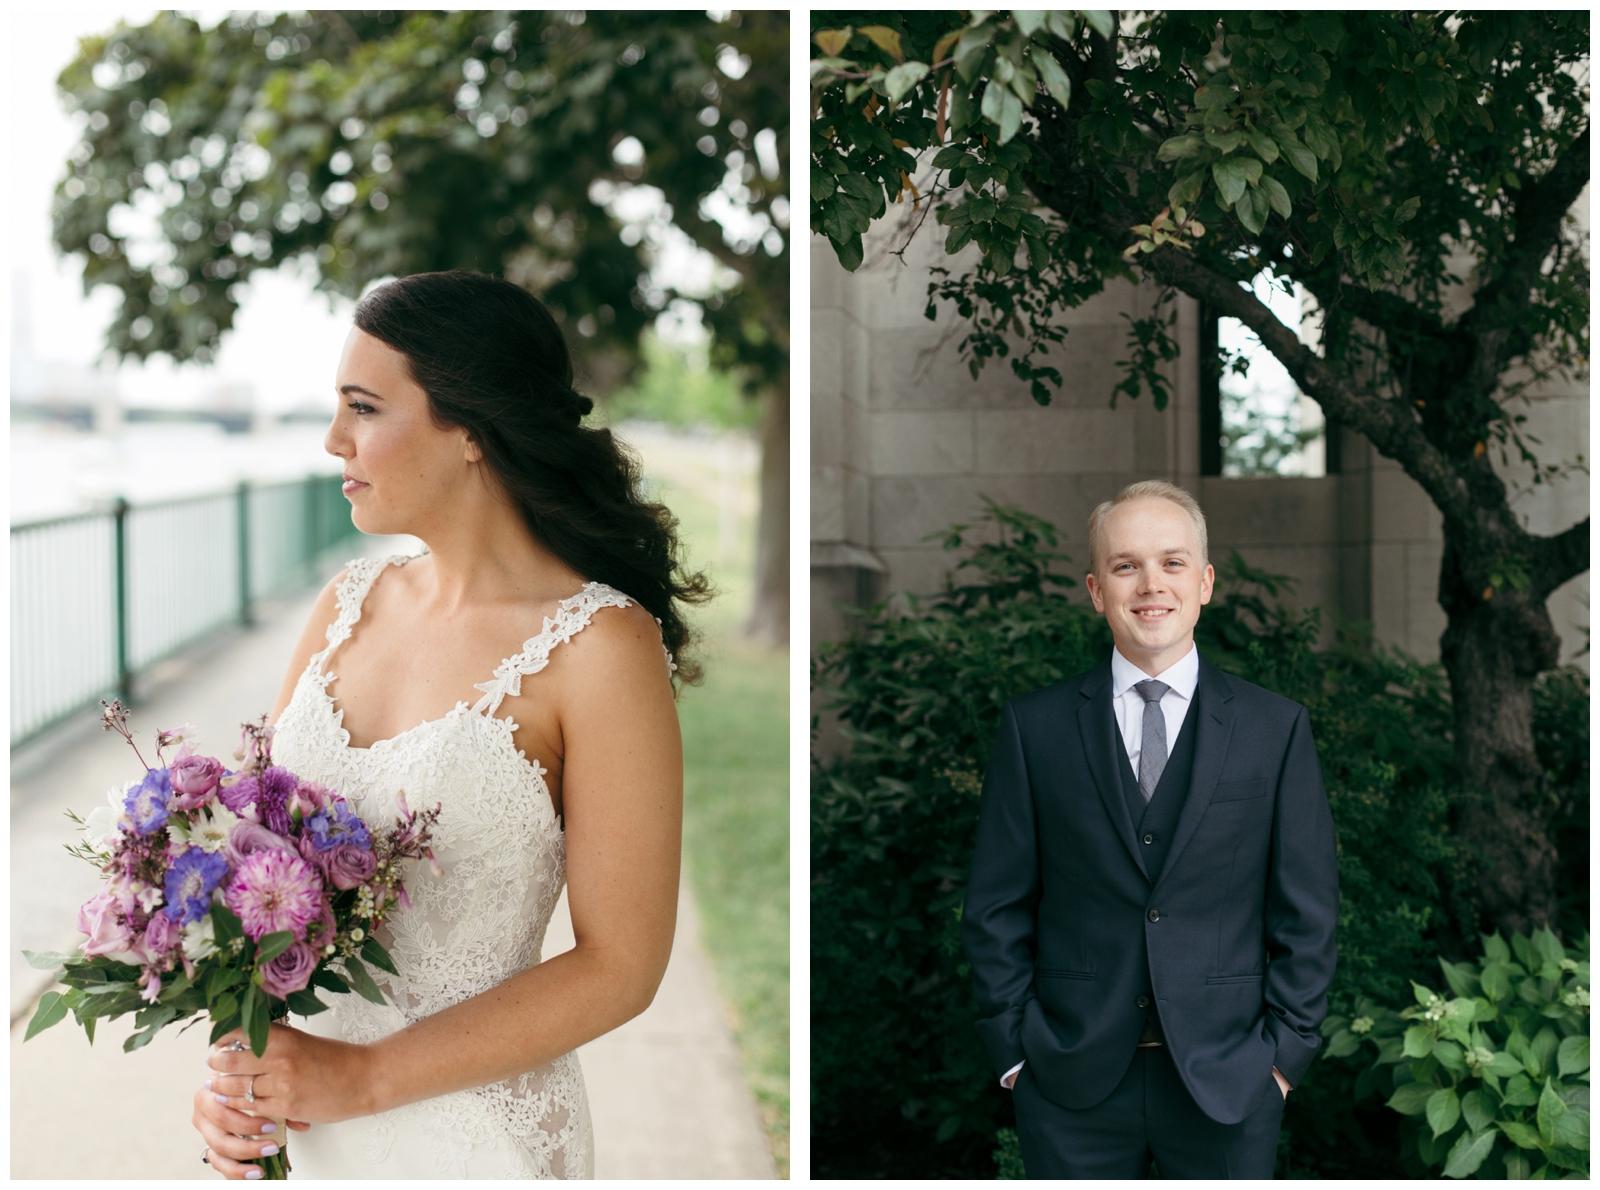 Bailey-Q-Photo-Royal-Sonesta-Boston-Wedding-Photographer-030.jpg